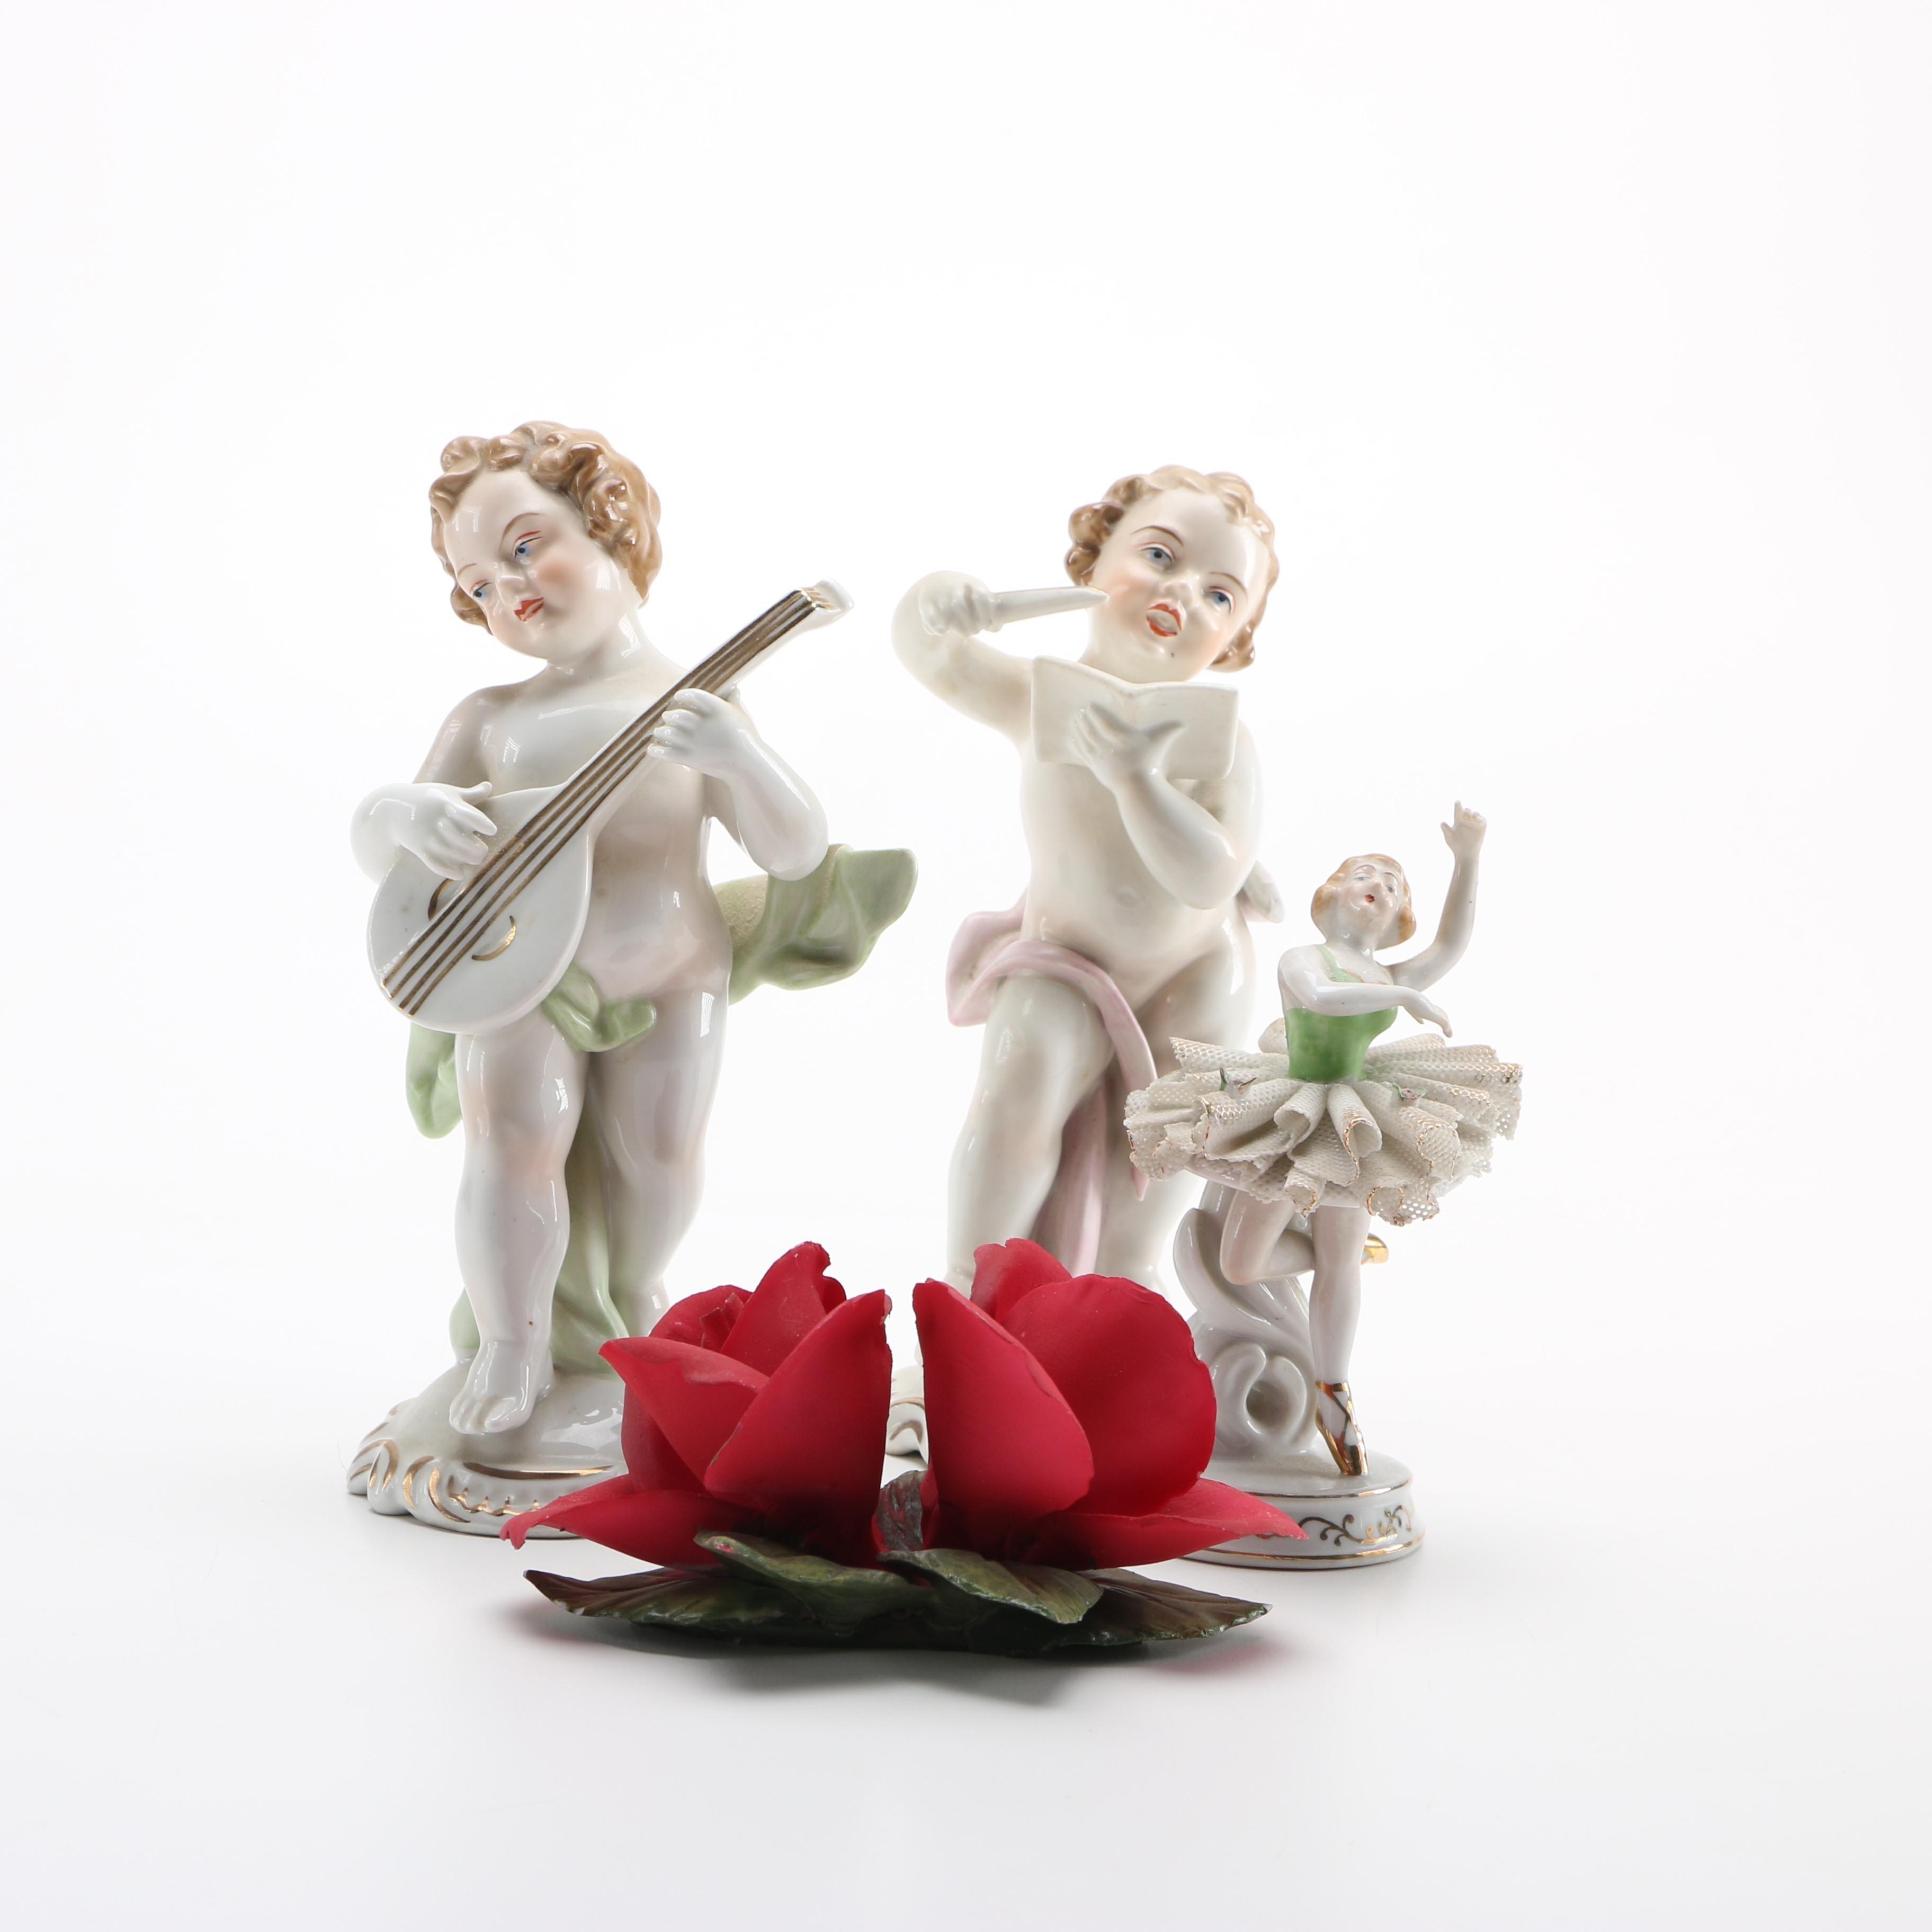 Porcelain Figurines Including Capodimonte and Otzens